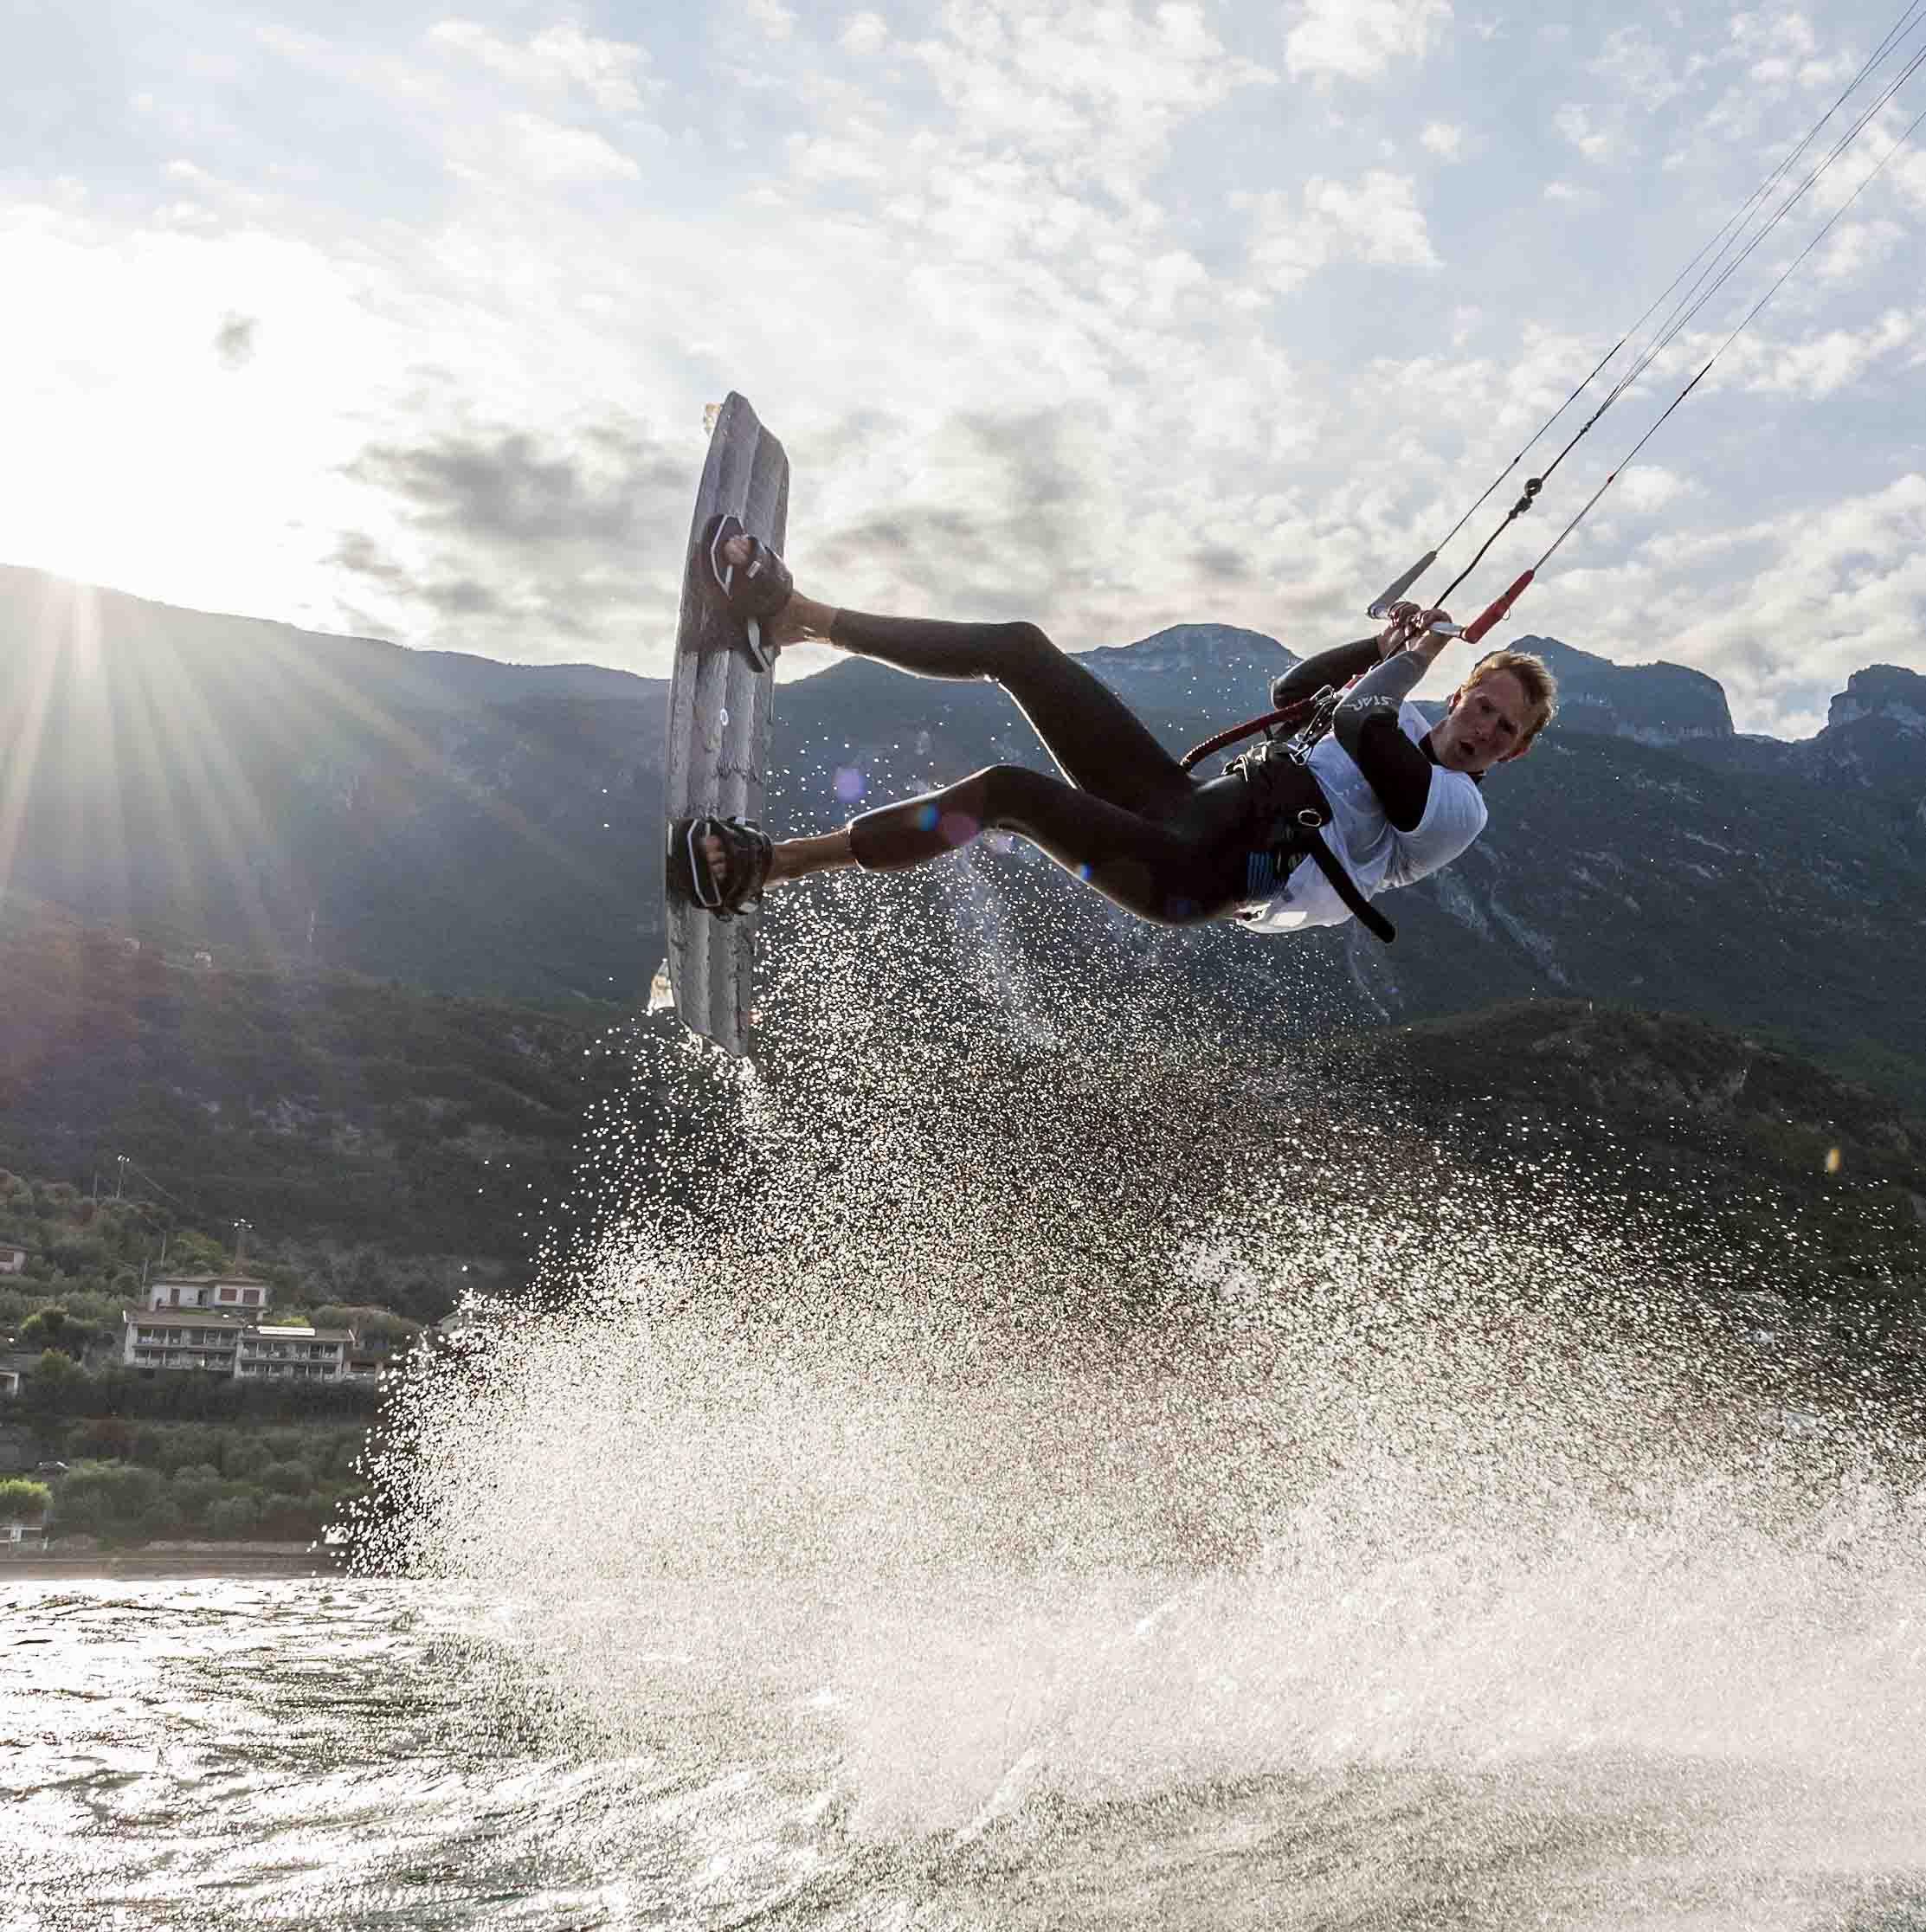 Kitesurfen.jpg